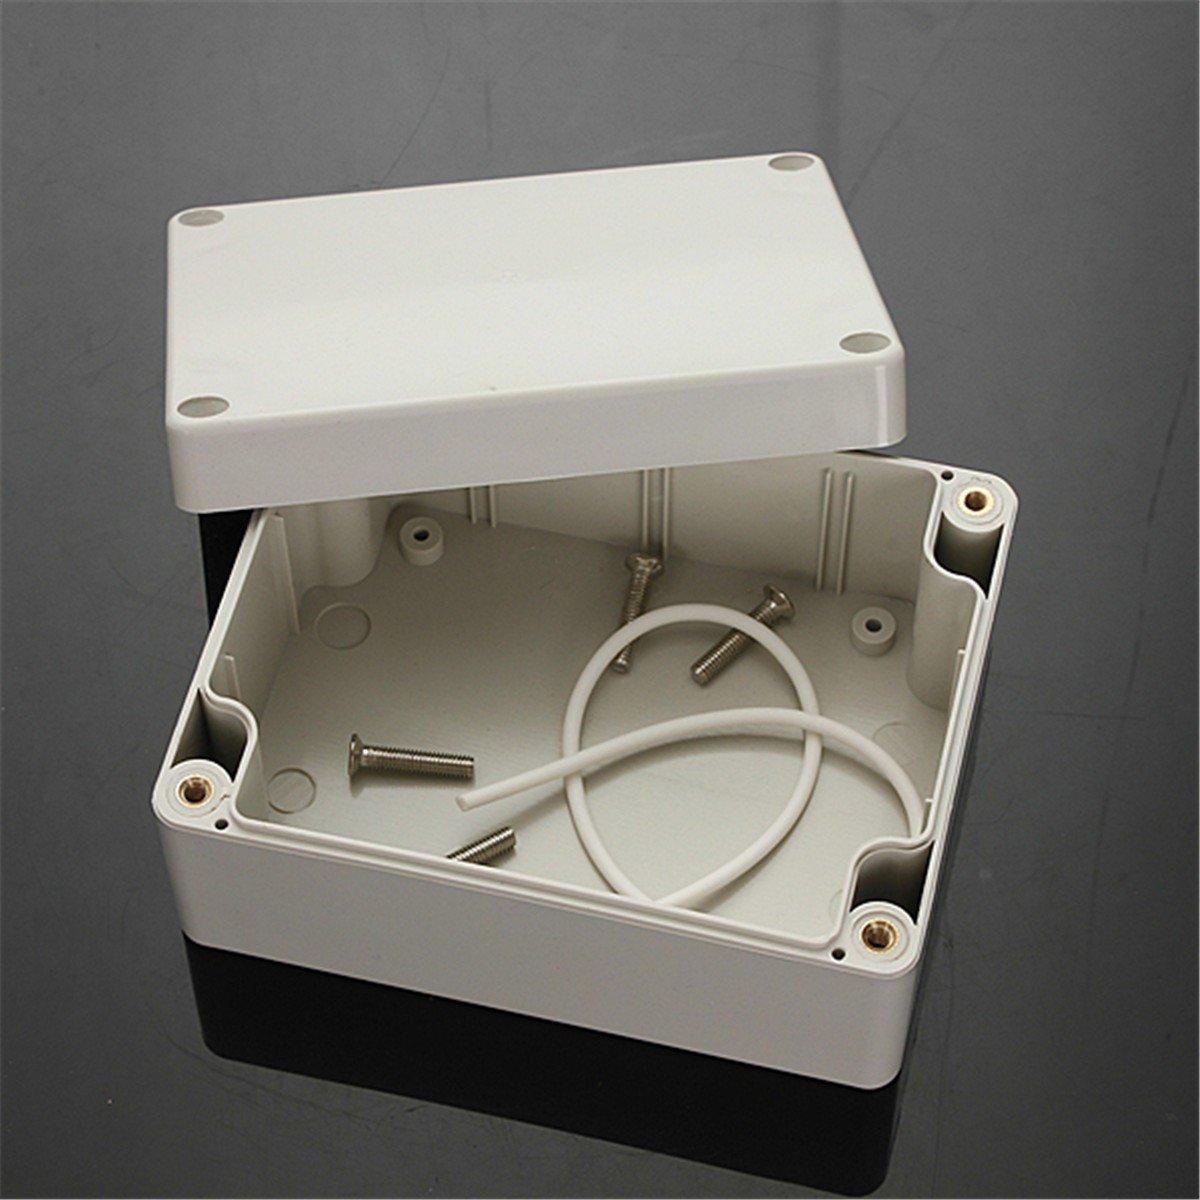 XXXL 200x120x75mm IP65 Wasserdichte Anschlussdosen Kunststoffgeh/äuse Verdrahtung Anschluss DIY Fall Power Abzweigdose